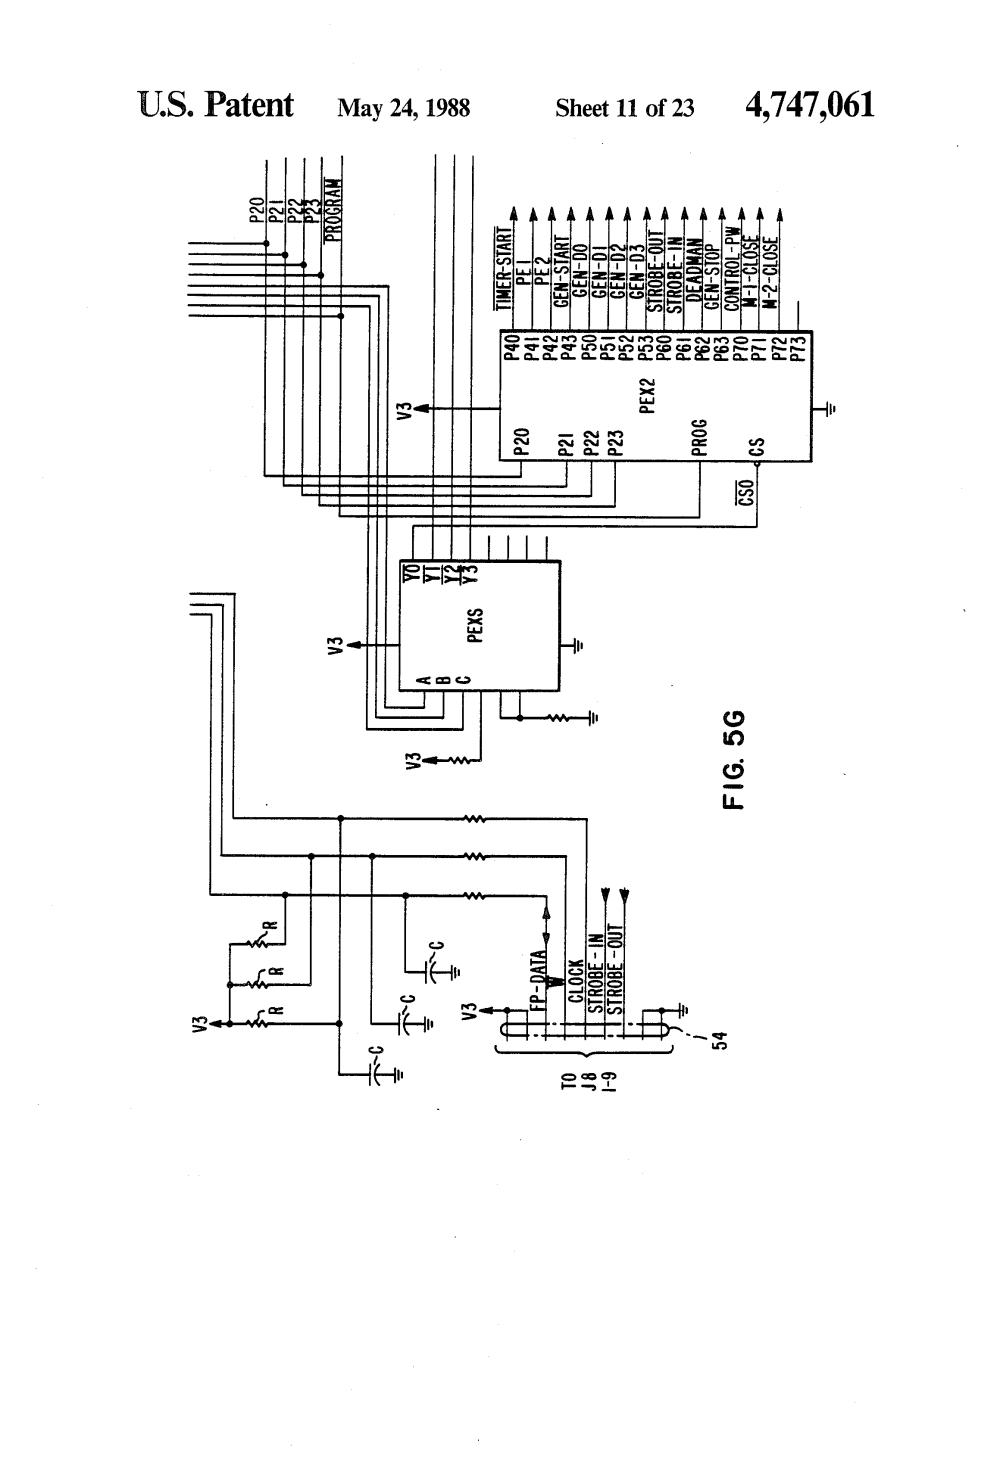 medium resolution of p42 commerical wiring diagram 29 wiring diagram images daewoo cielo wiring diagram daewoo cielo electrical wiring